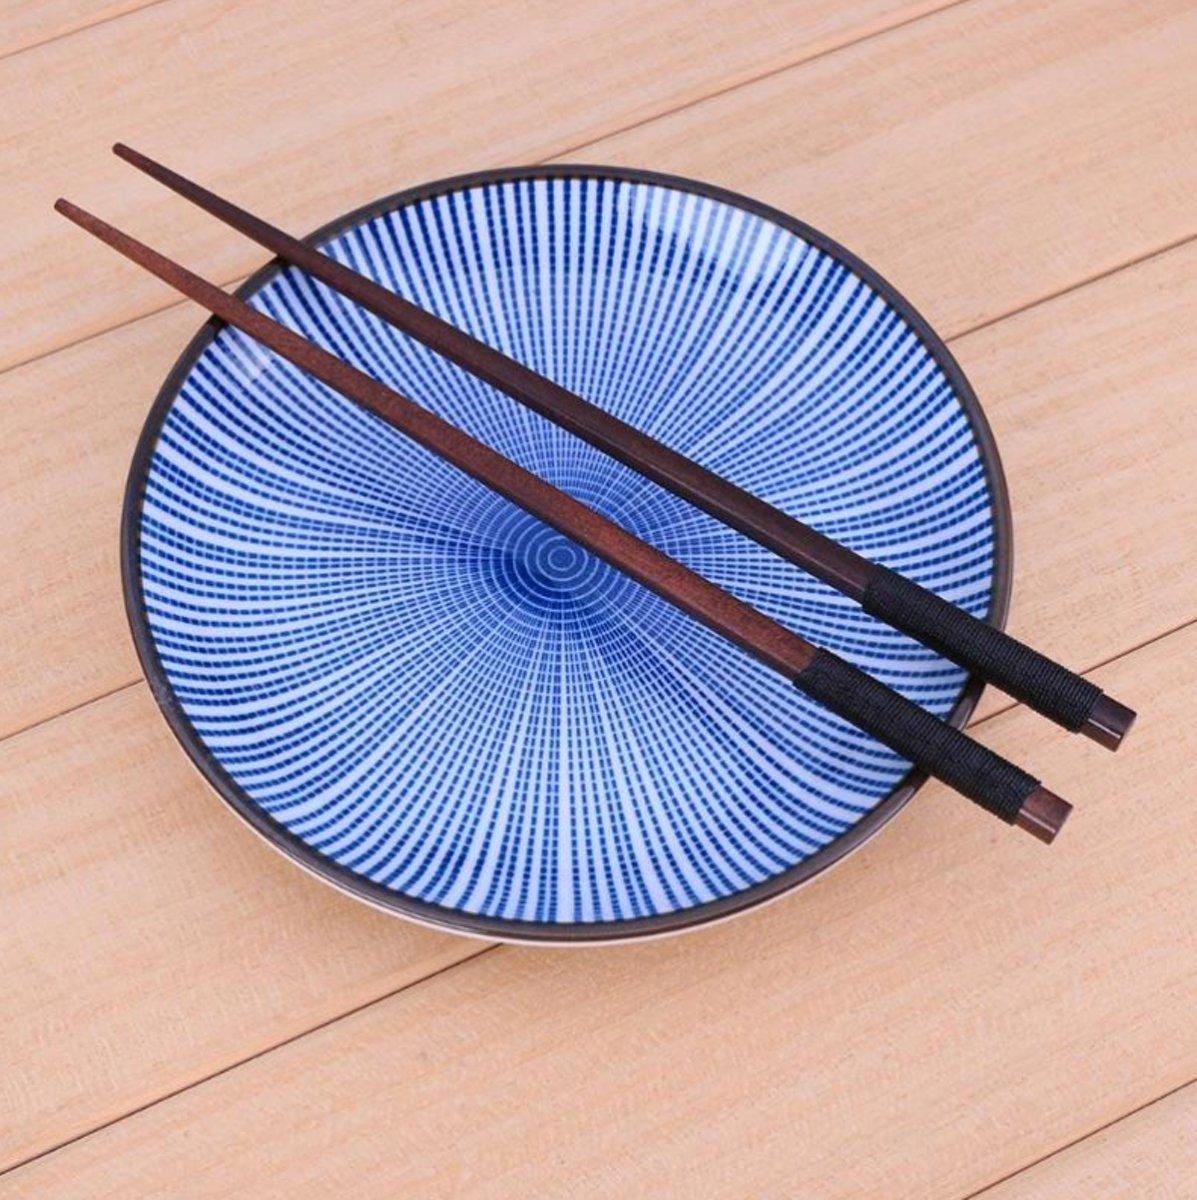 Eetstokjes - 1 paar - kastanje hout - Handgemaakte Chopsticks - Chinese Eet Stokjes - Bruin